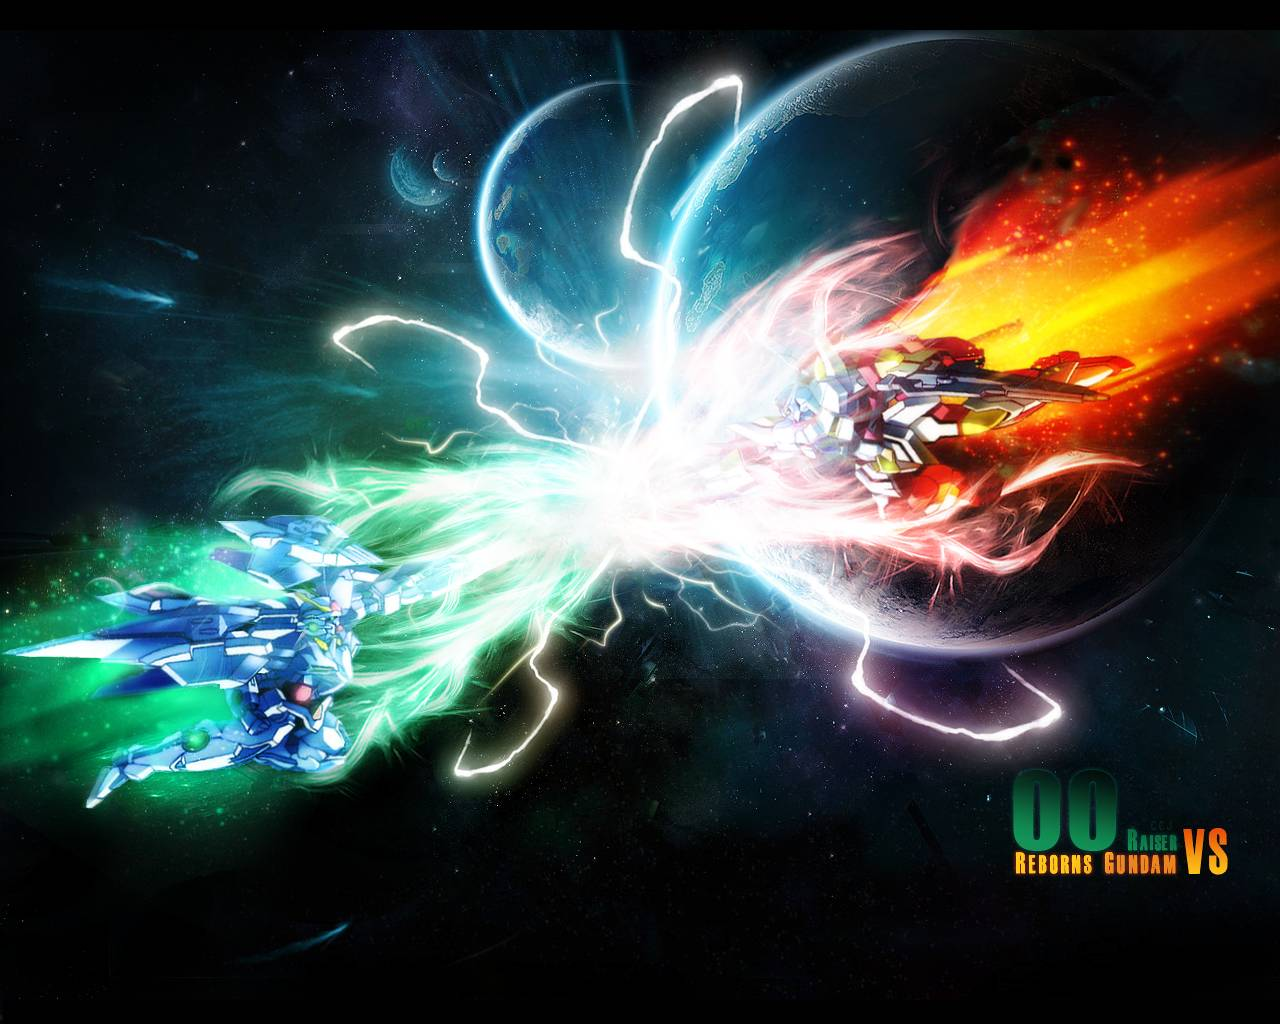 double o raiser vs reborns gundam   Gundam 00 Wallpaper 1280x1024